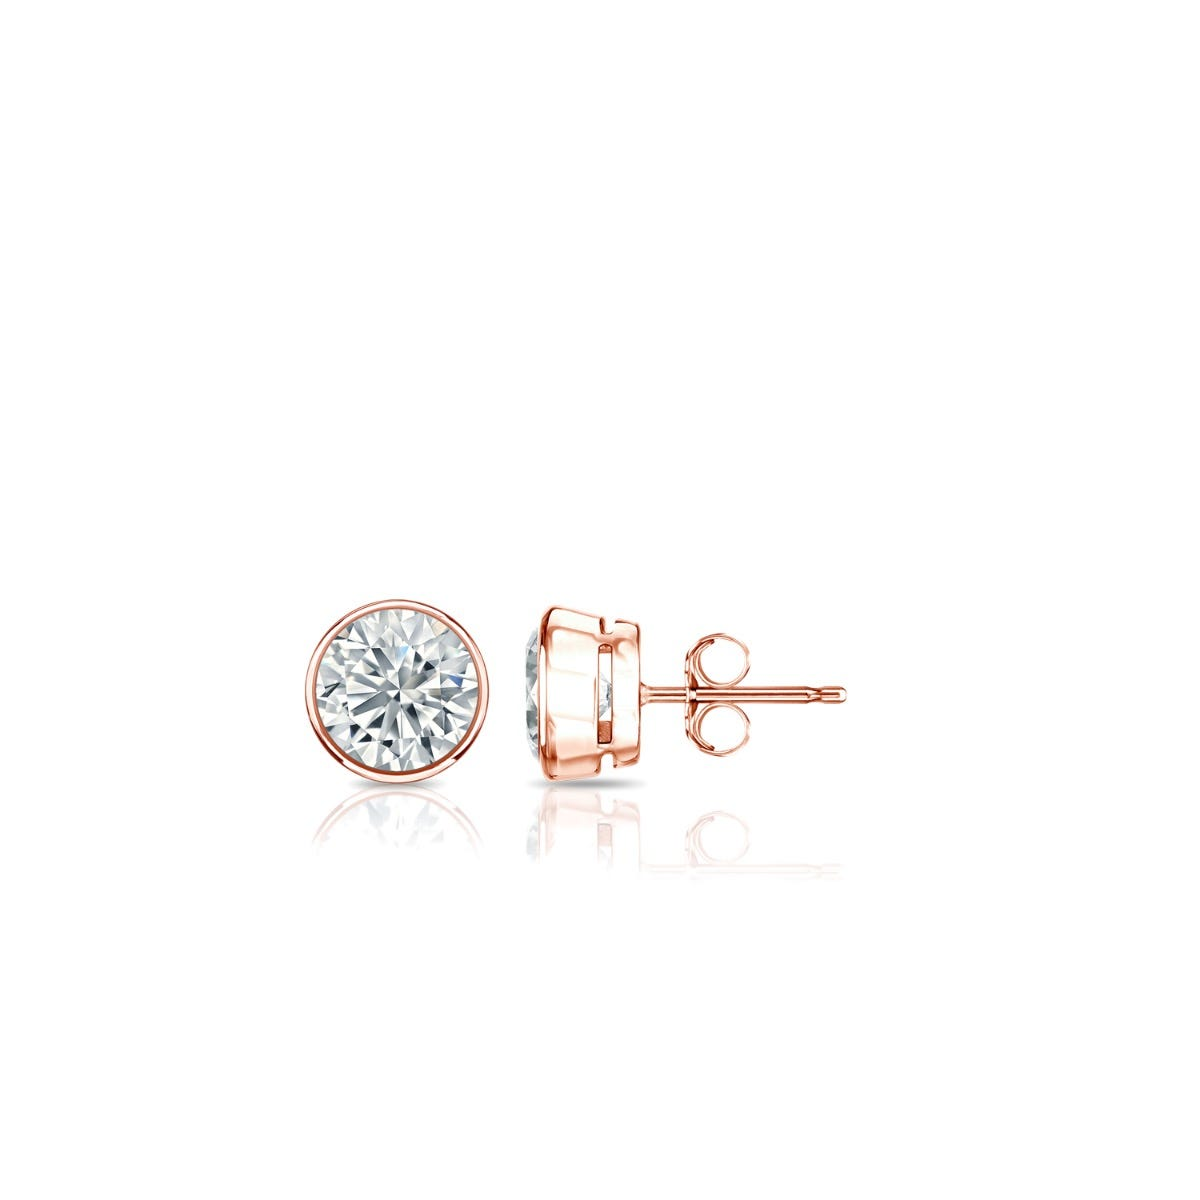 Diamond Round Bezel-Set 1/5ctw. Solitaire Stud (IJ-I2) Earrings in 14K Rose Gold